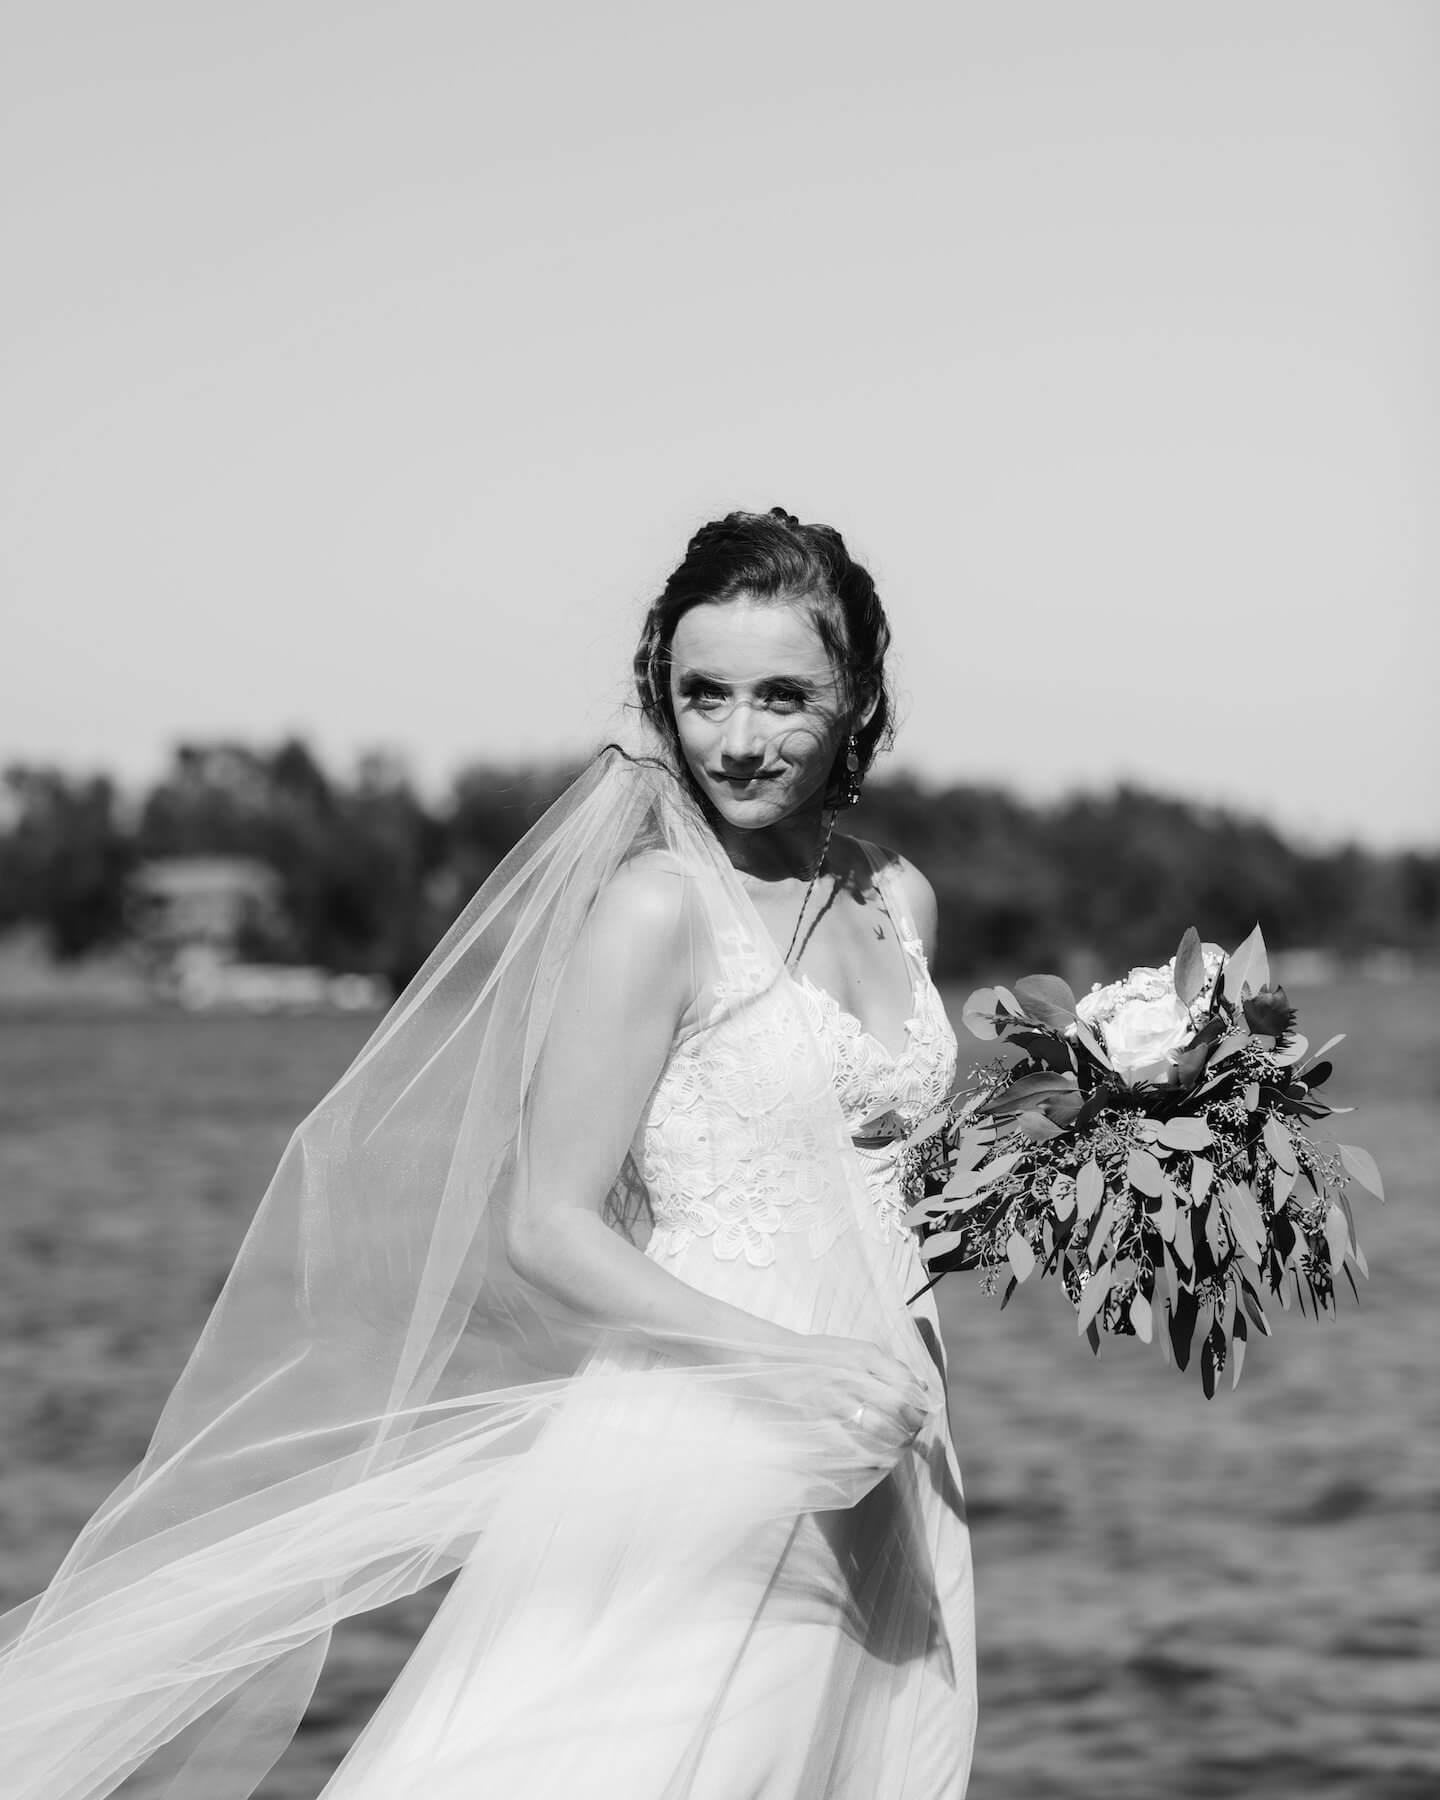 engle-olson-wedding-blair-taylor-26.jpg